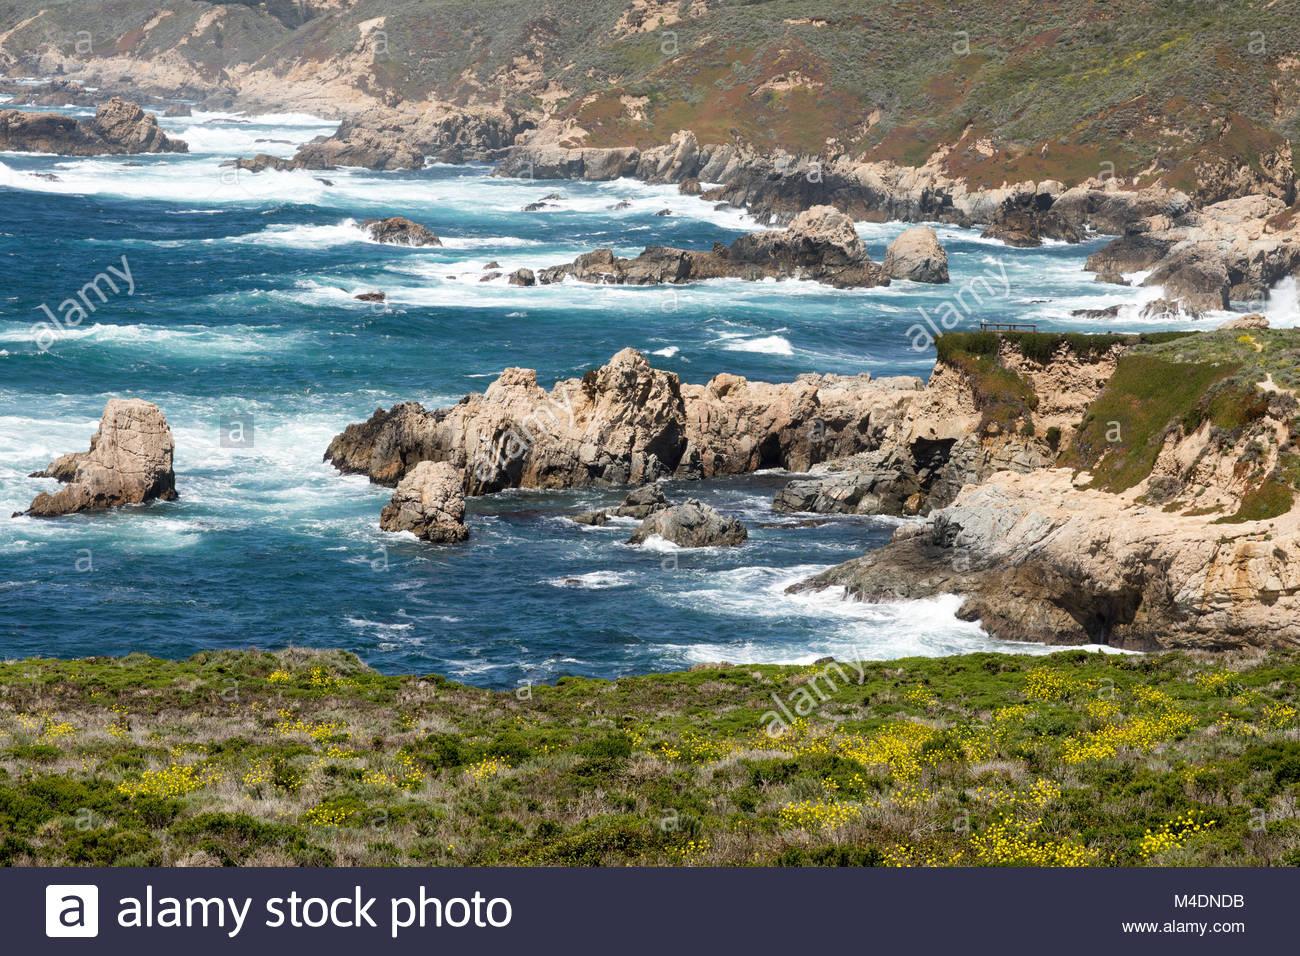 Garrapata State Park Coastal Views at Springtime. - Stock Image